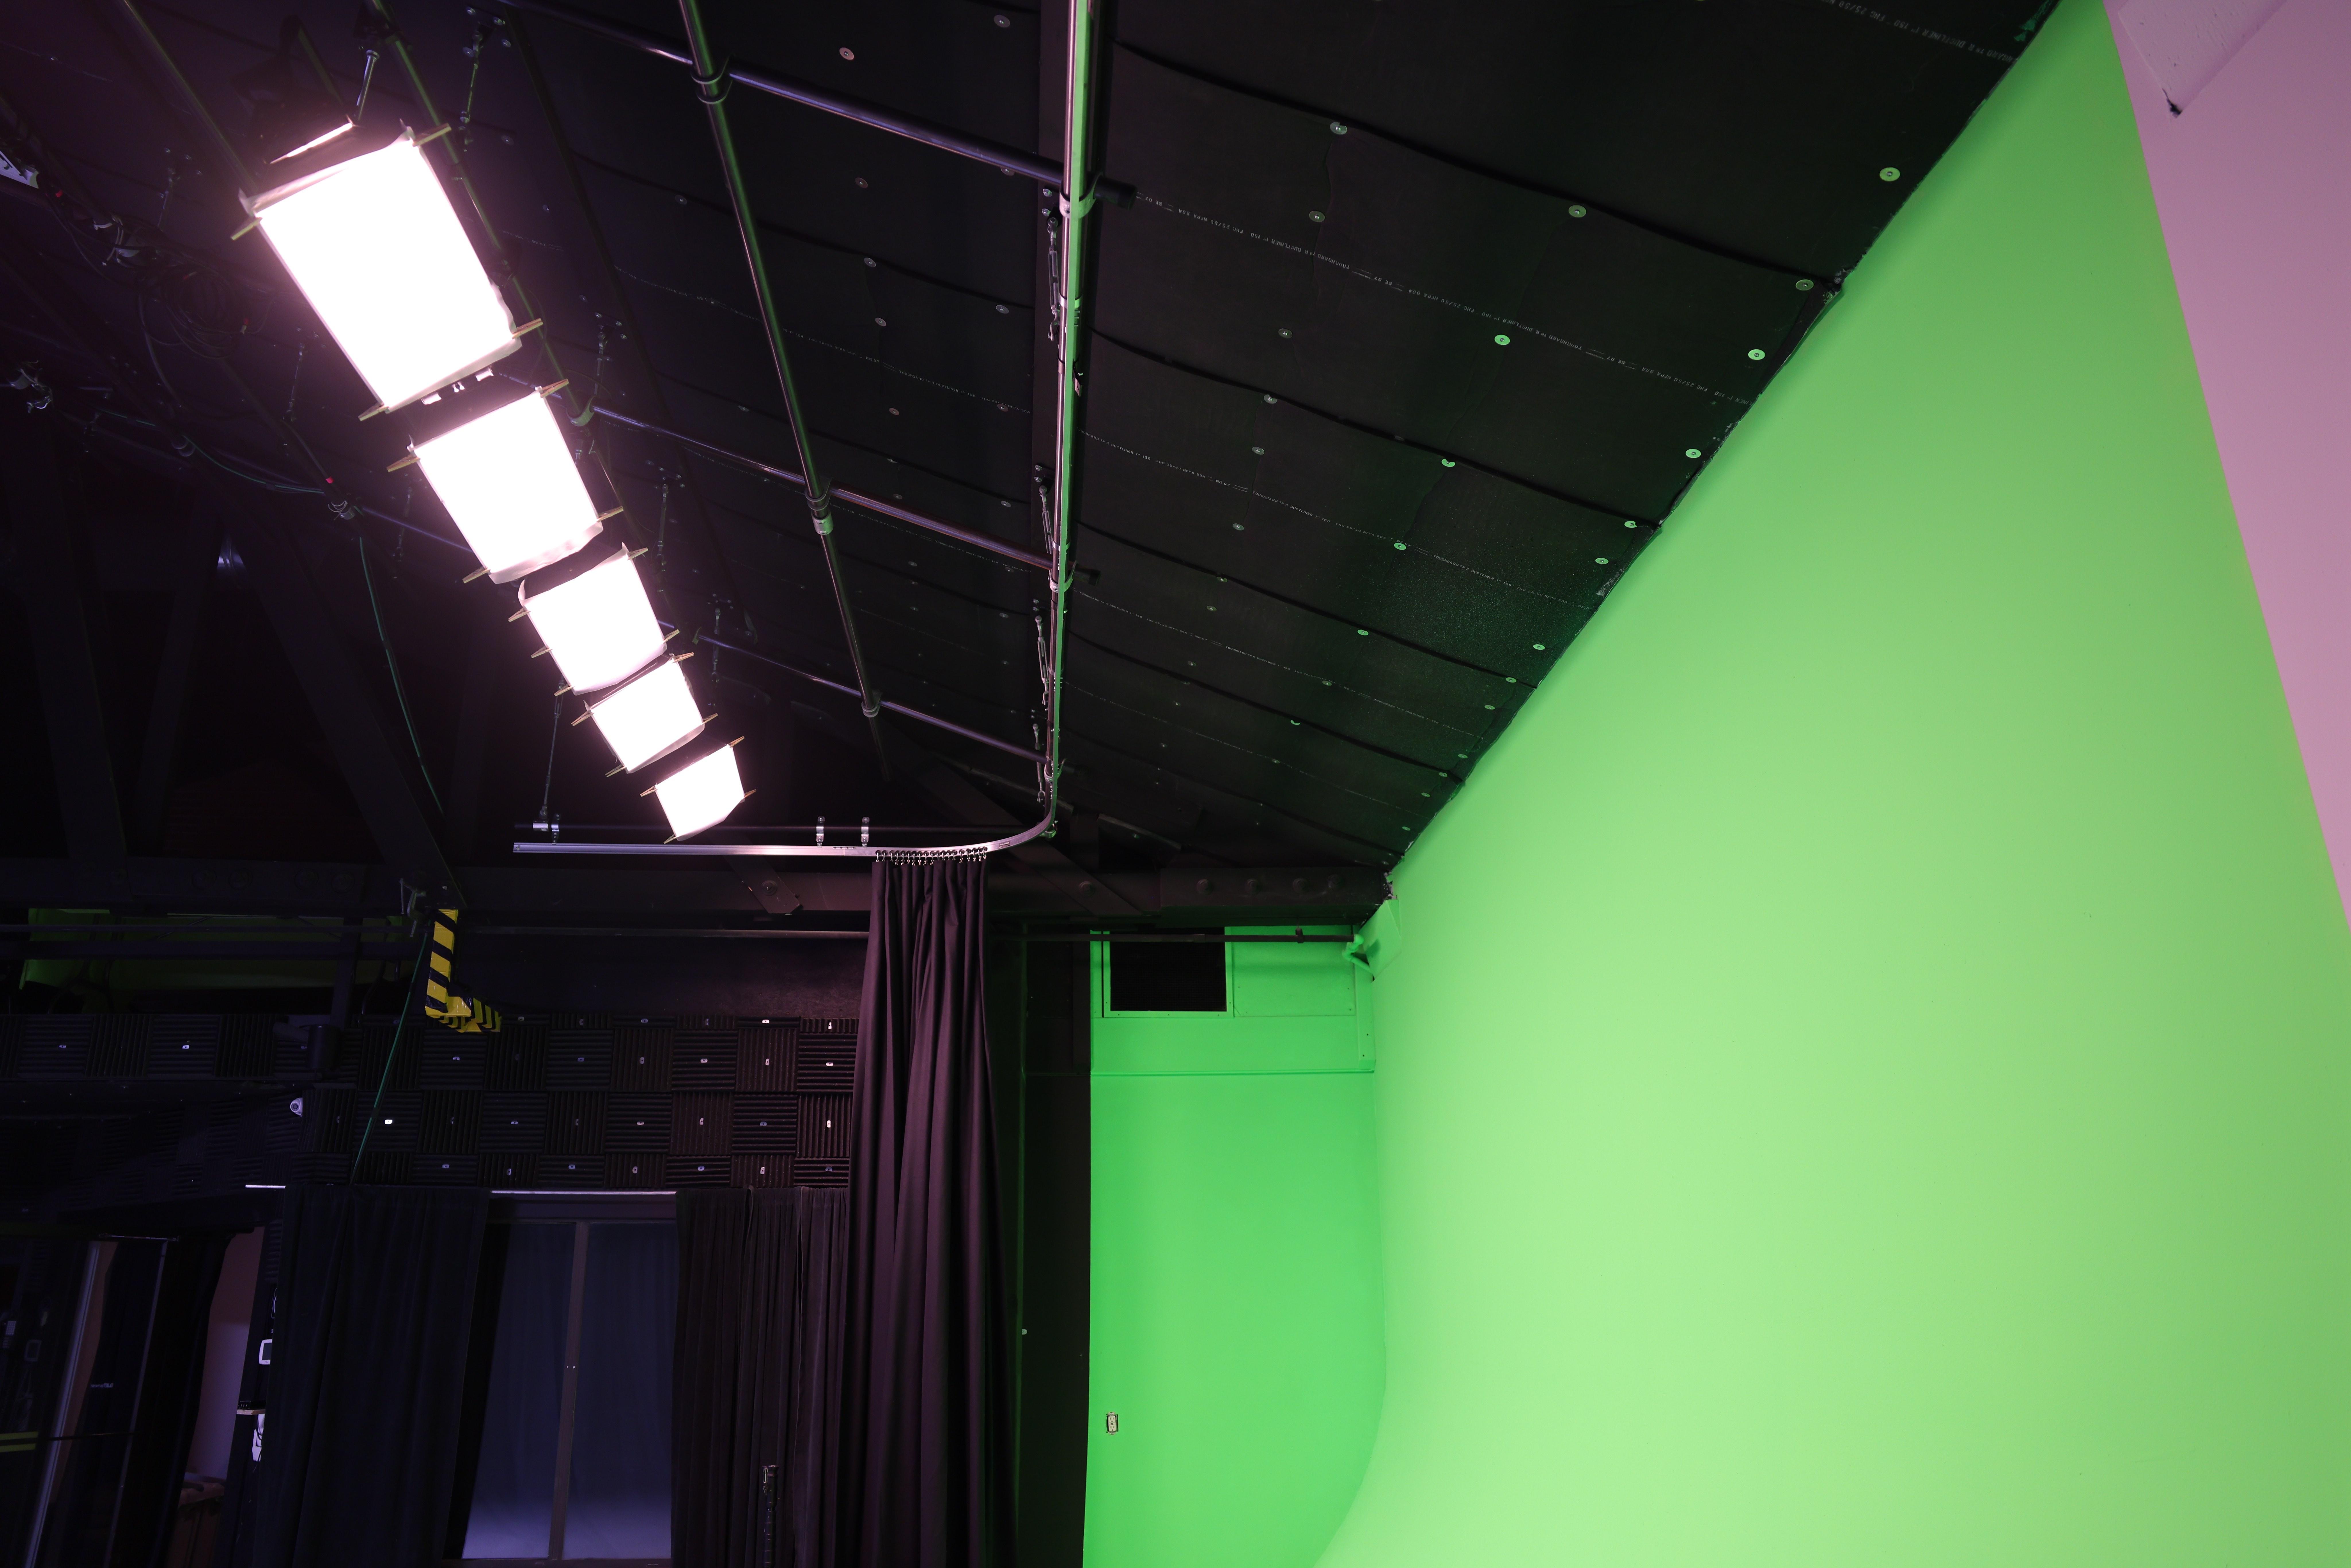 Pre-Lit Green Screen Cyc Wall